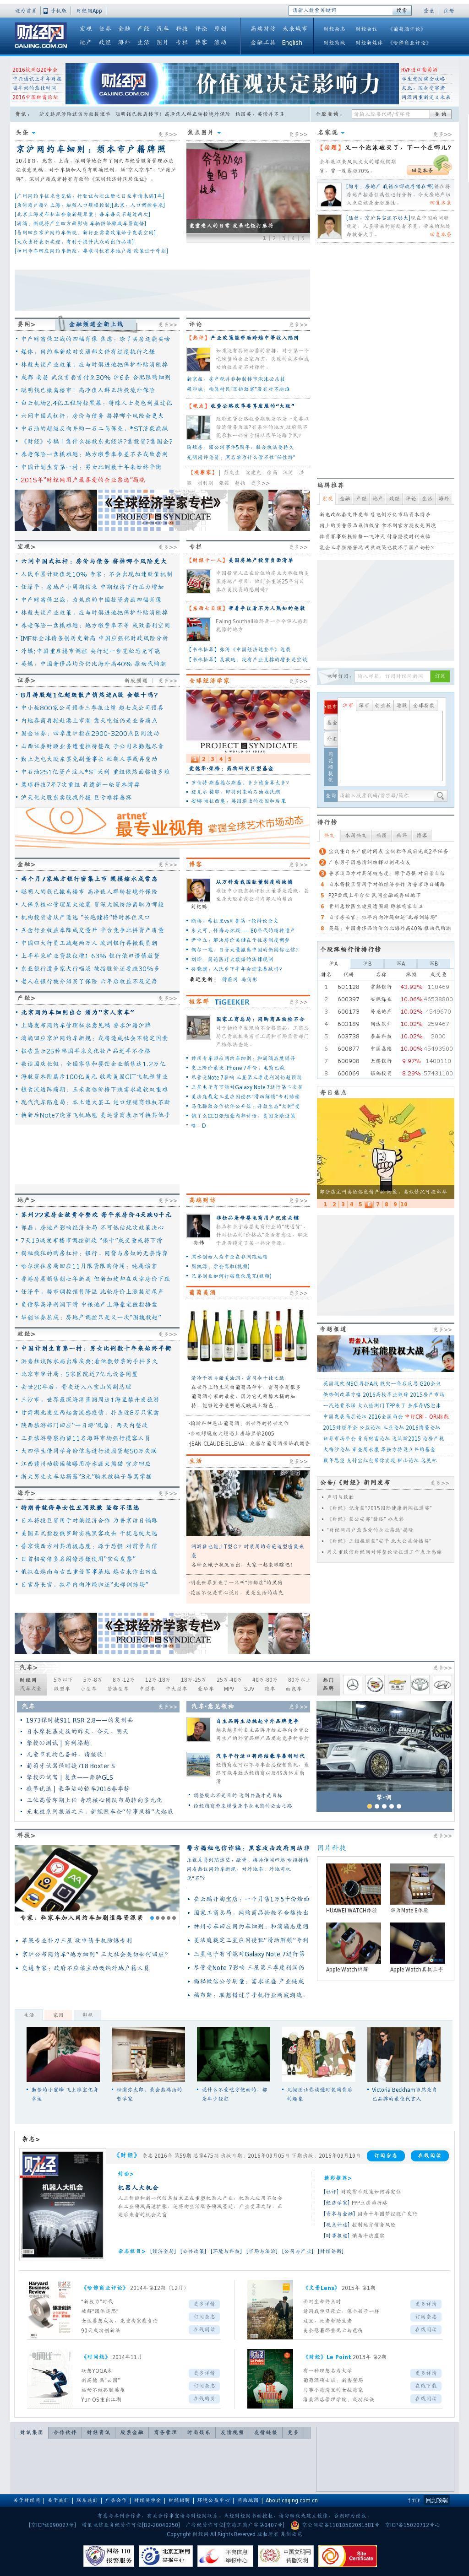 Caijing at Sunday Oct. 9, 2016, 1:01 a.m. UTC